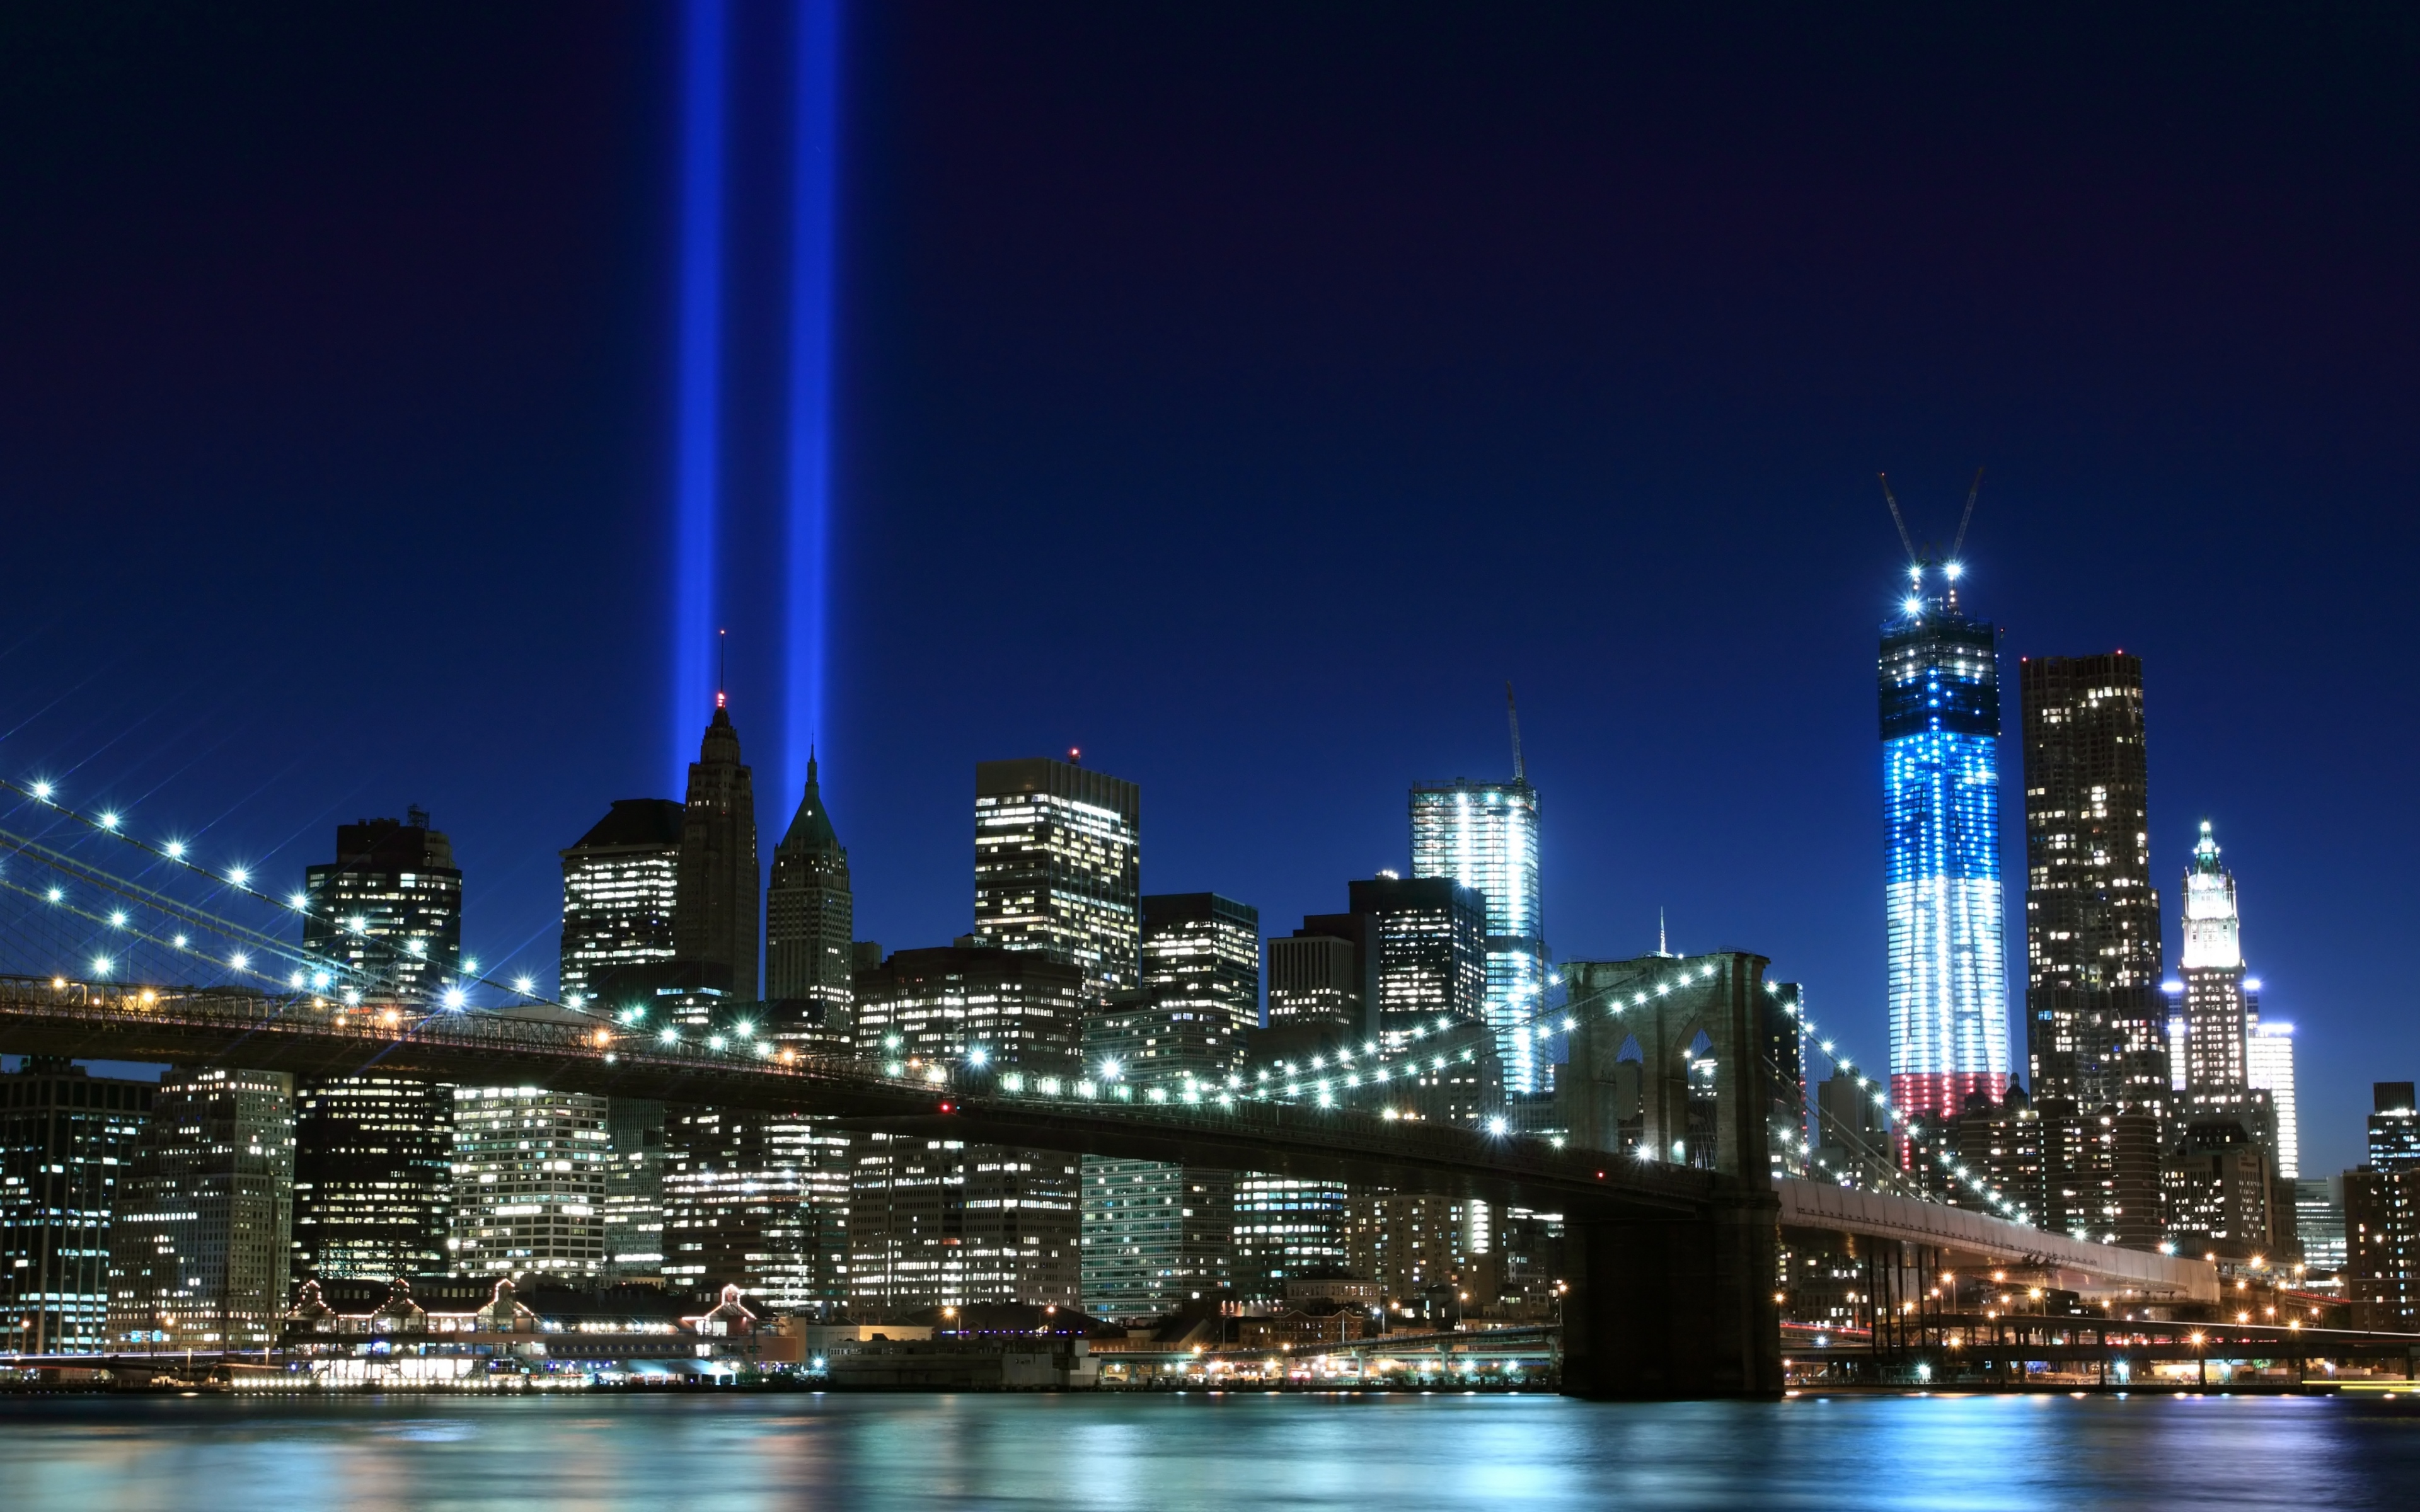 Bridge New York City Night View Lights Wallpaper WallpapersByte 3840x2400